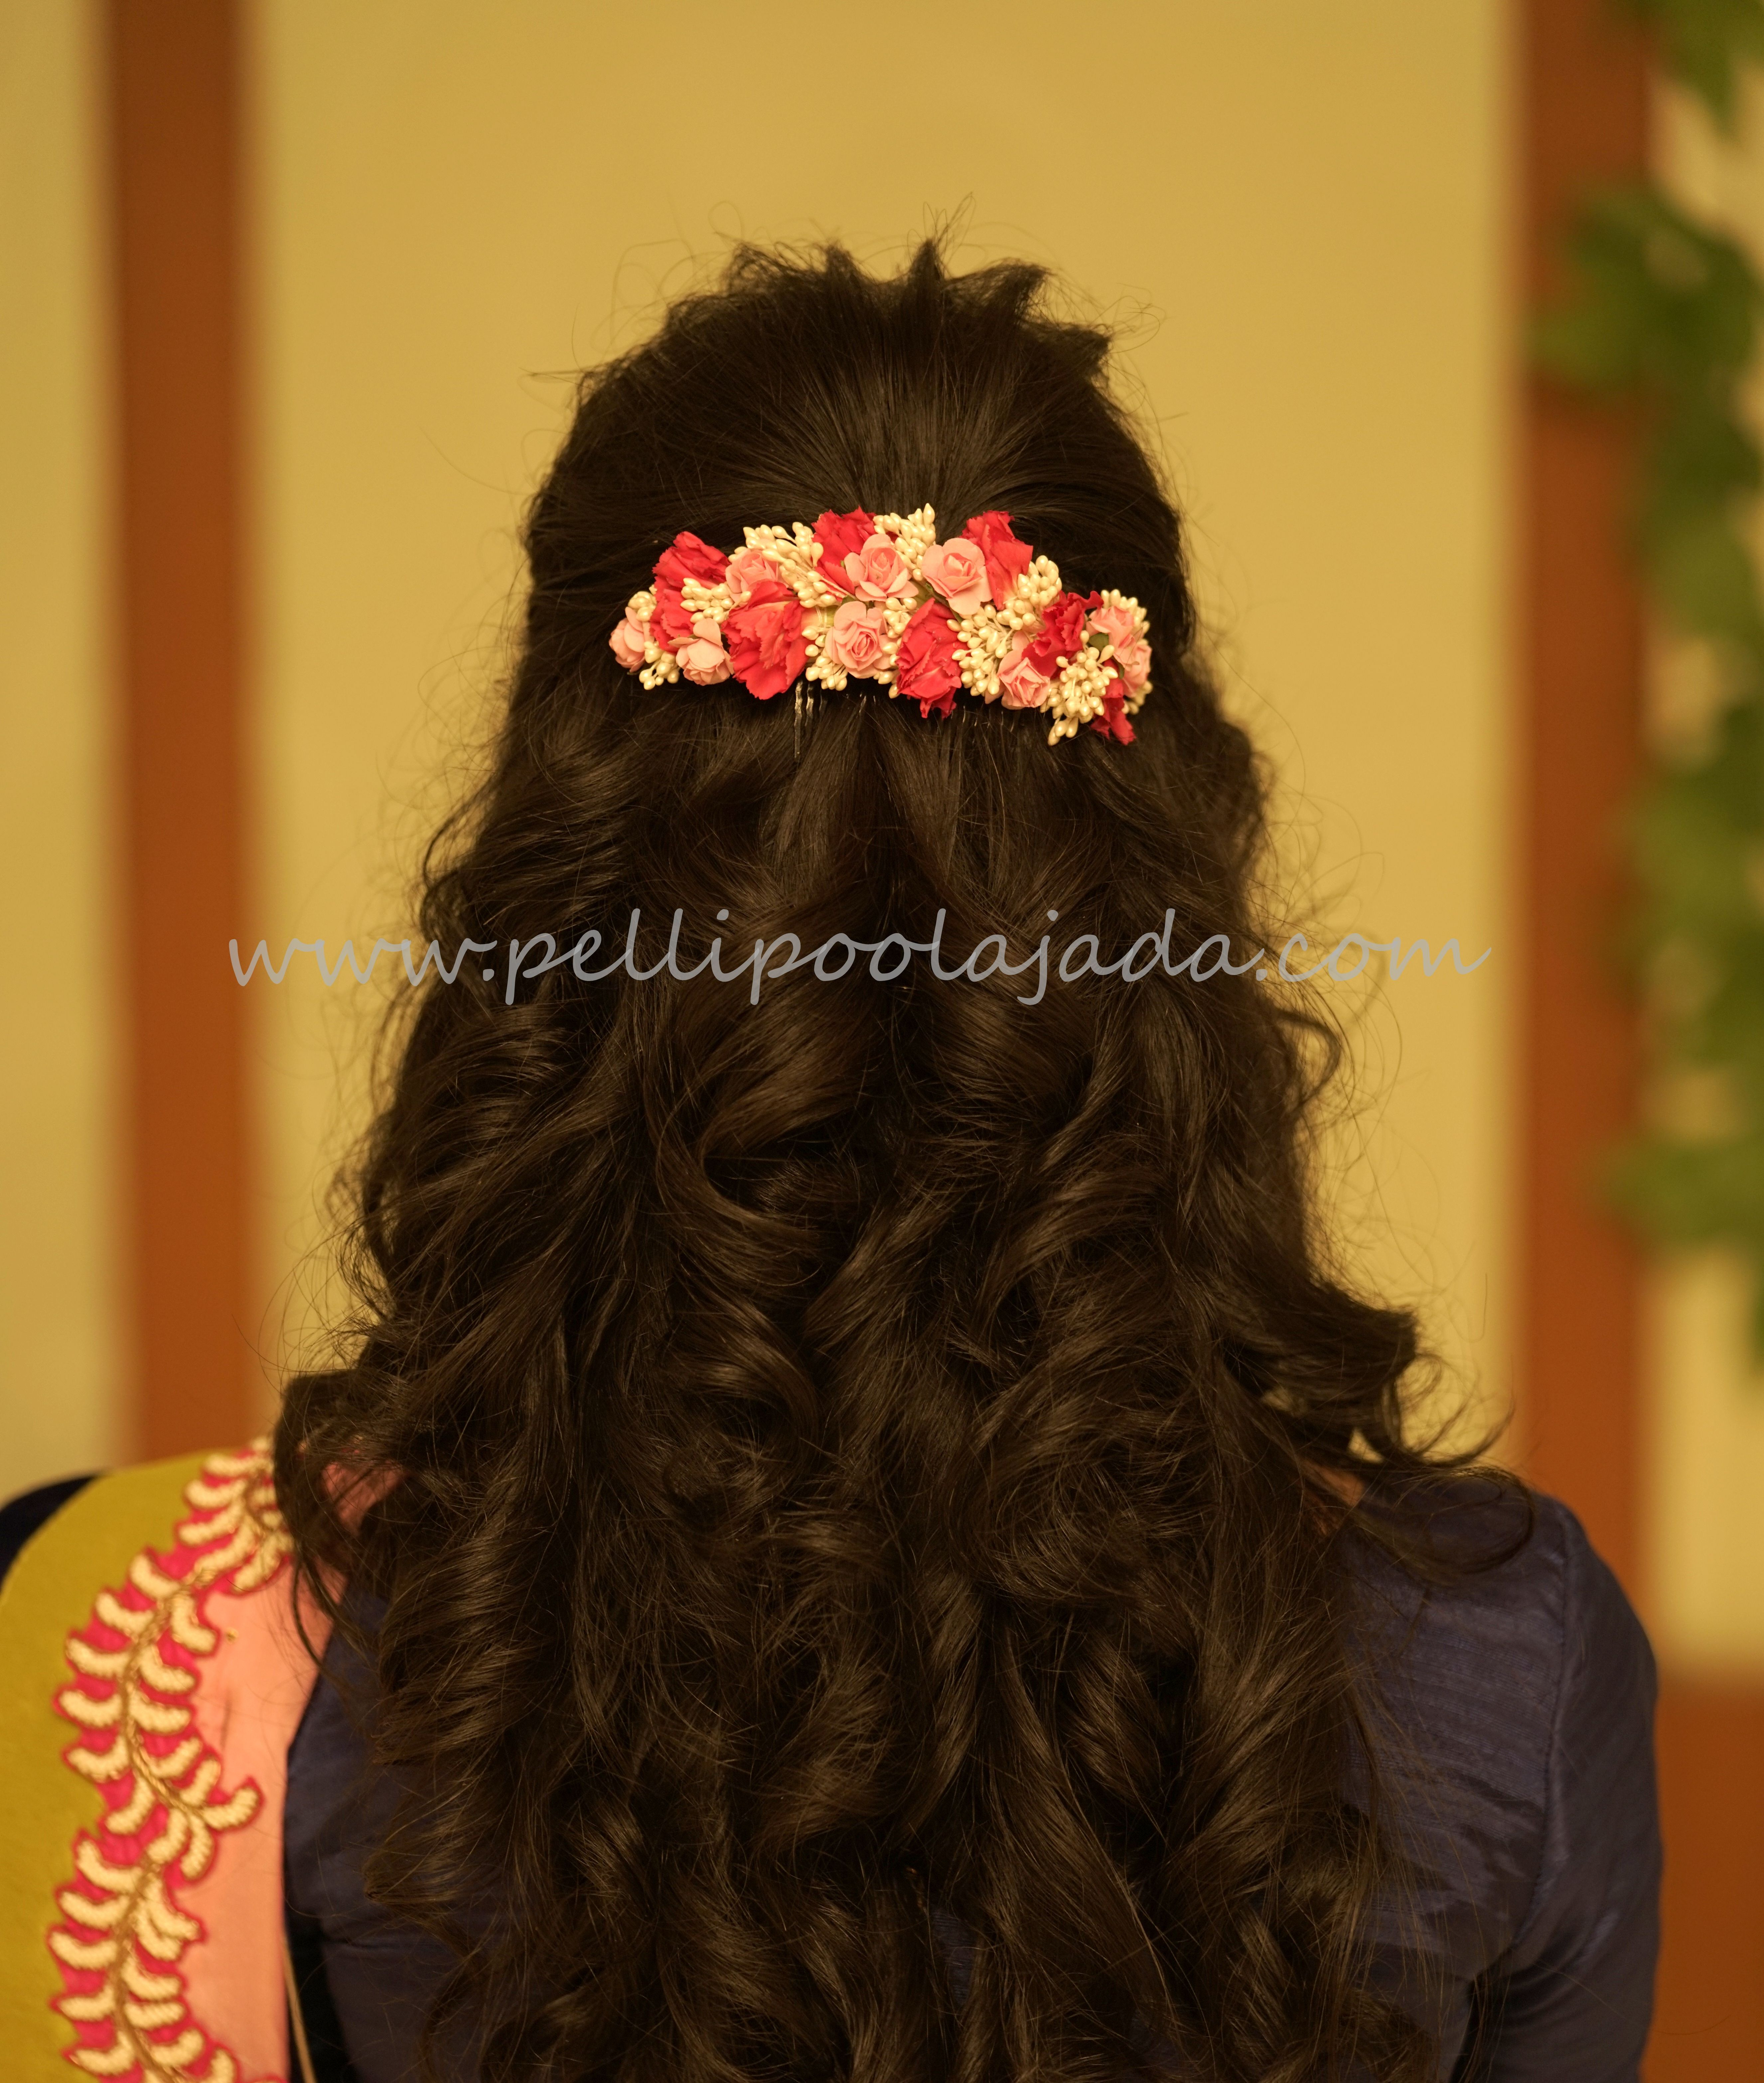 Designer Venis, fresh flower venis, floral veni  Indian bridal